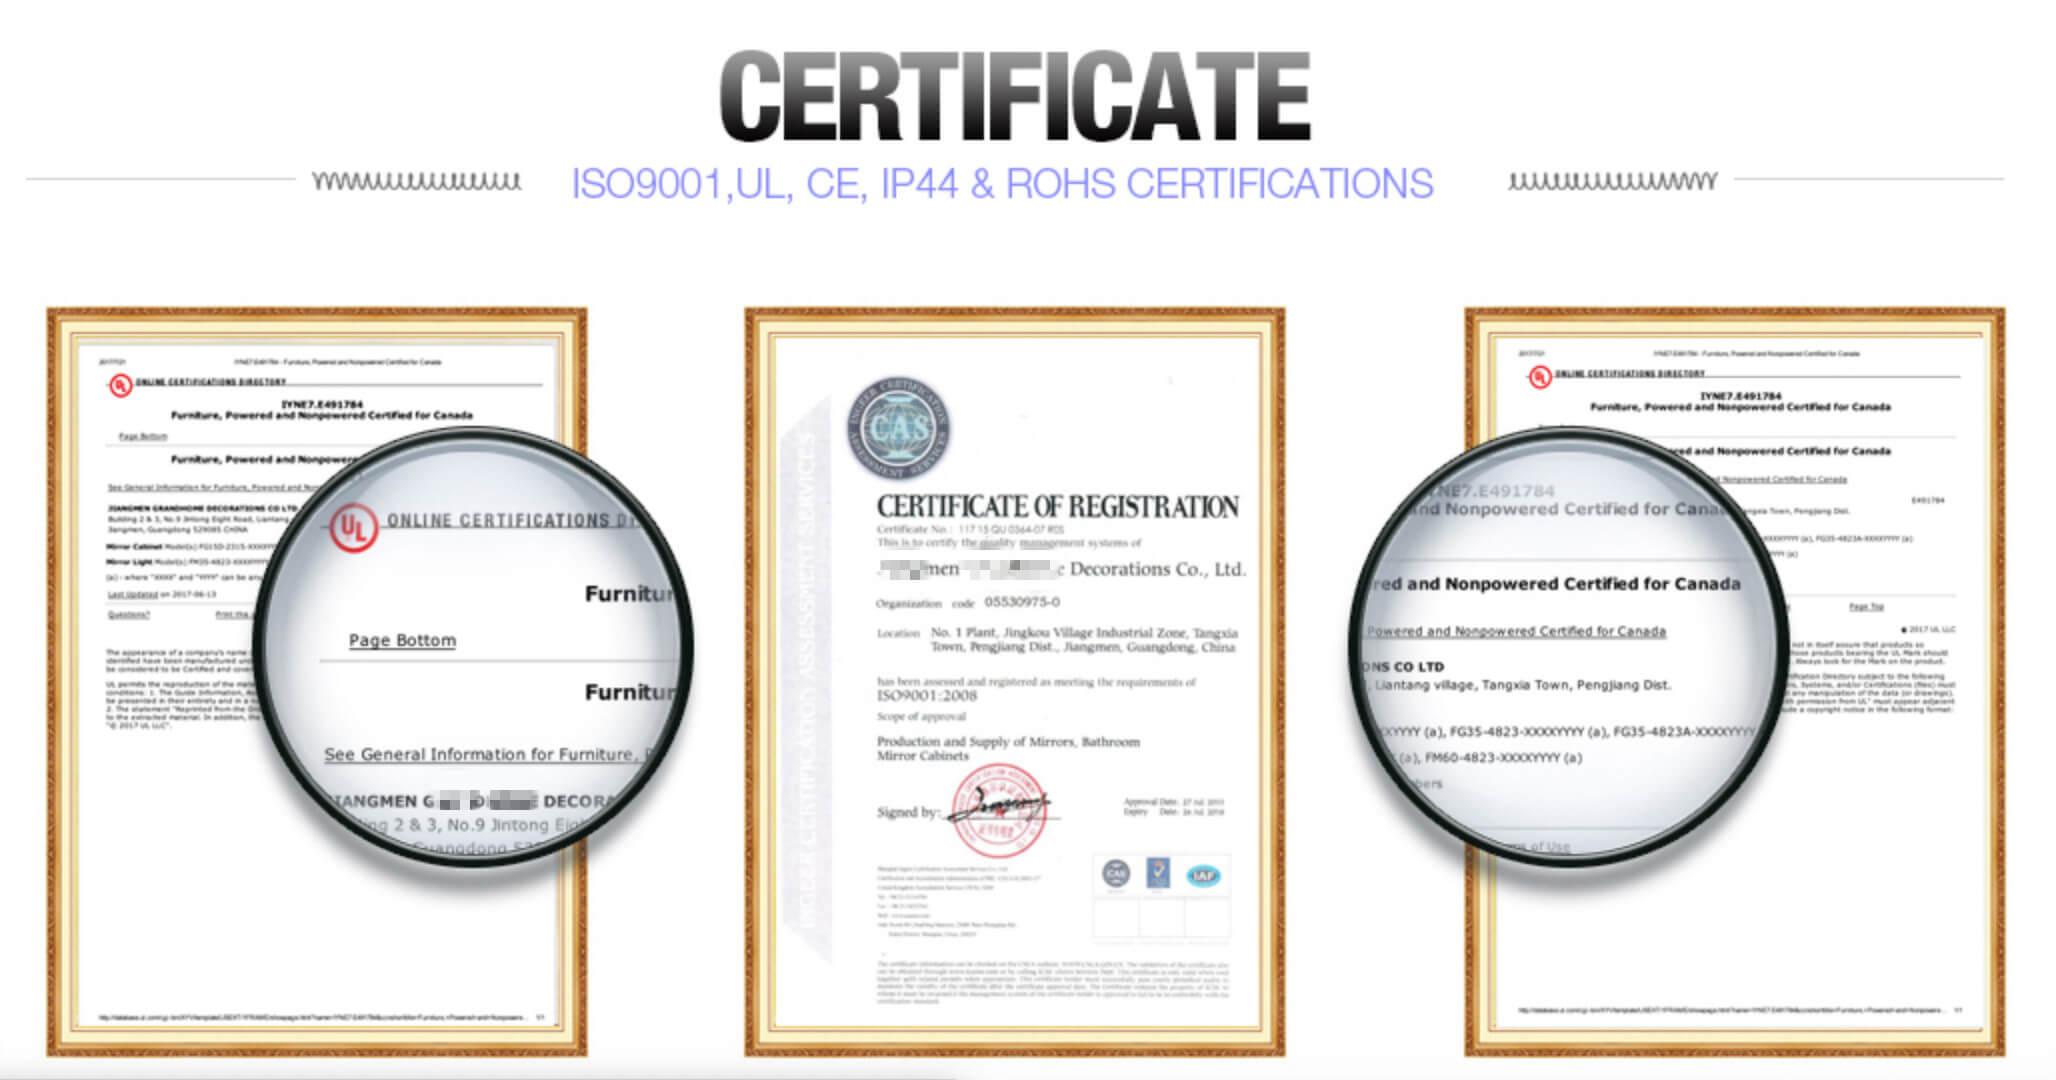 Wall Mirror Manufacturer certifications